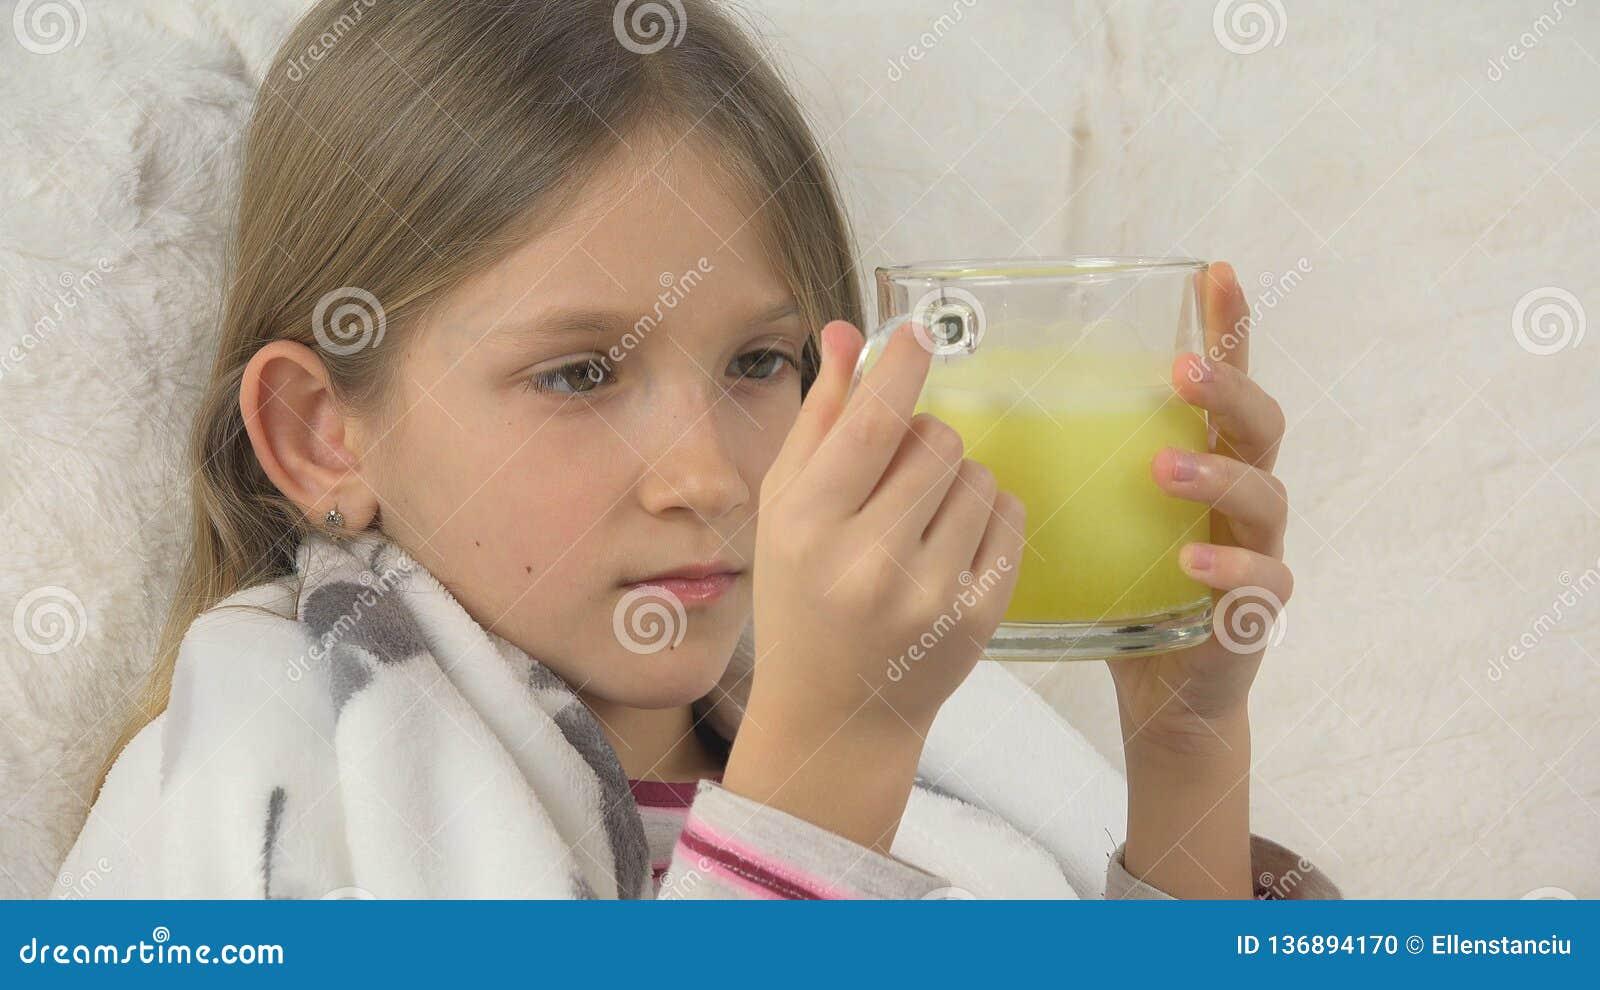 Krankes Kindergesichts-trinkende Drogen, trauriges krankes Mädchen, Kinderporträt mit Medikament, Sofa